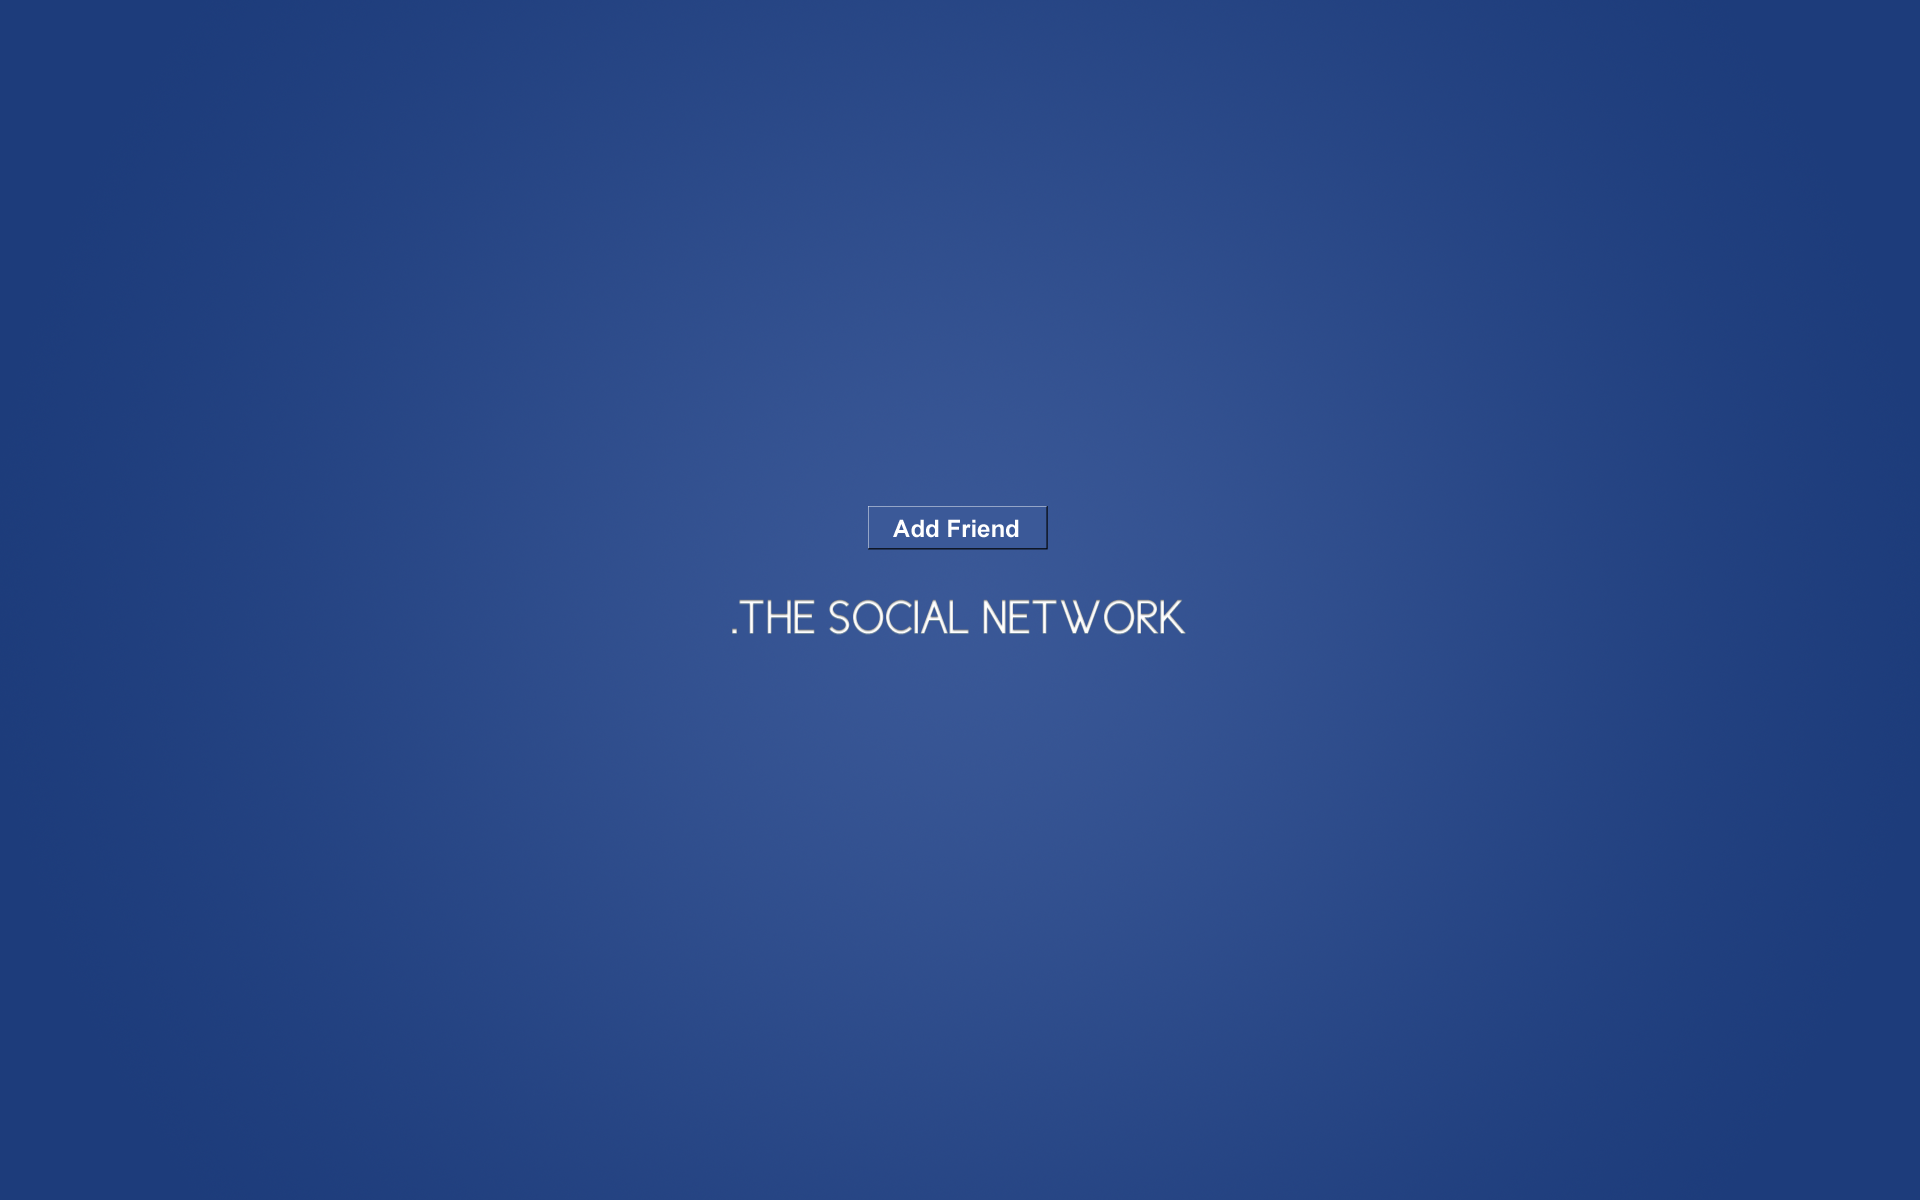 The Social Network Computer Wallpapers, Desktop ...